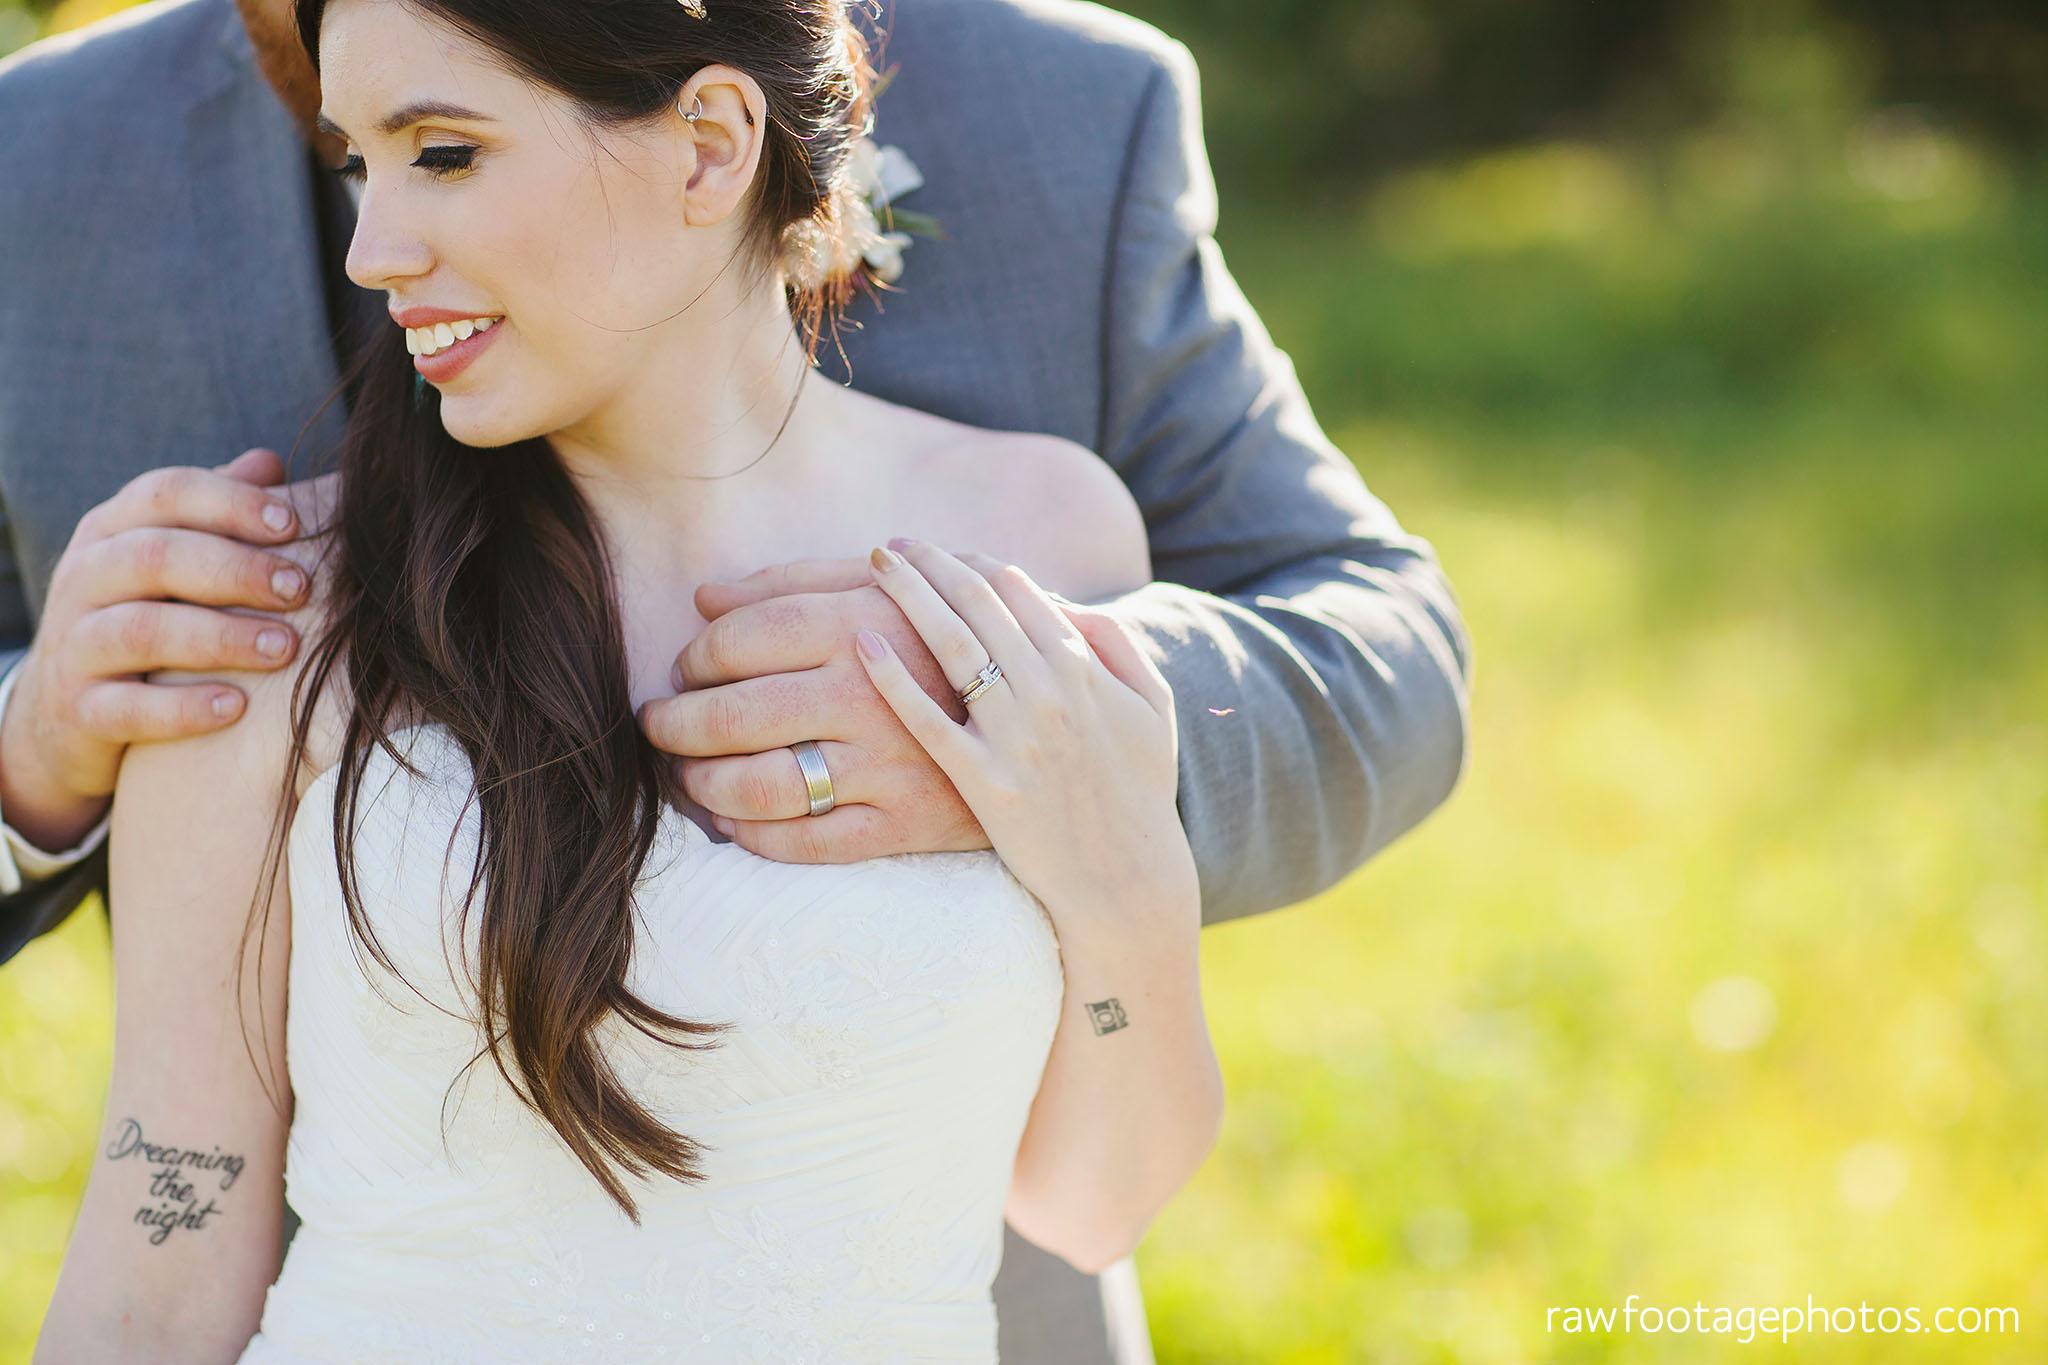 london_ontario_wedding_photographer-century_wedding_barn-raw_footage_photography-diy_wedding080.jpg